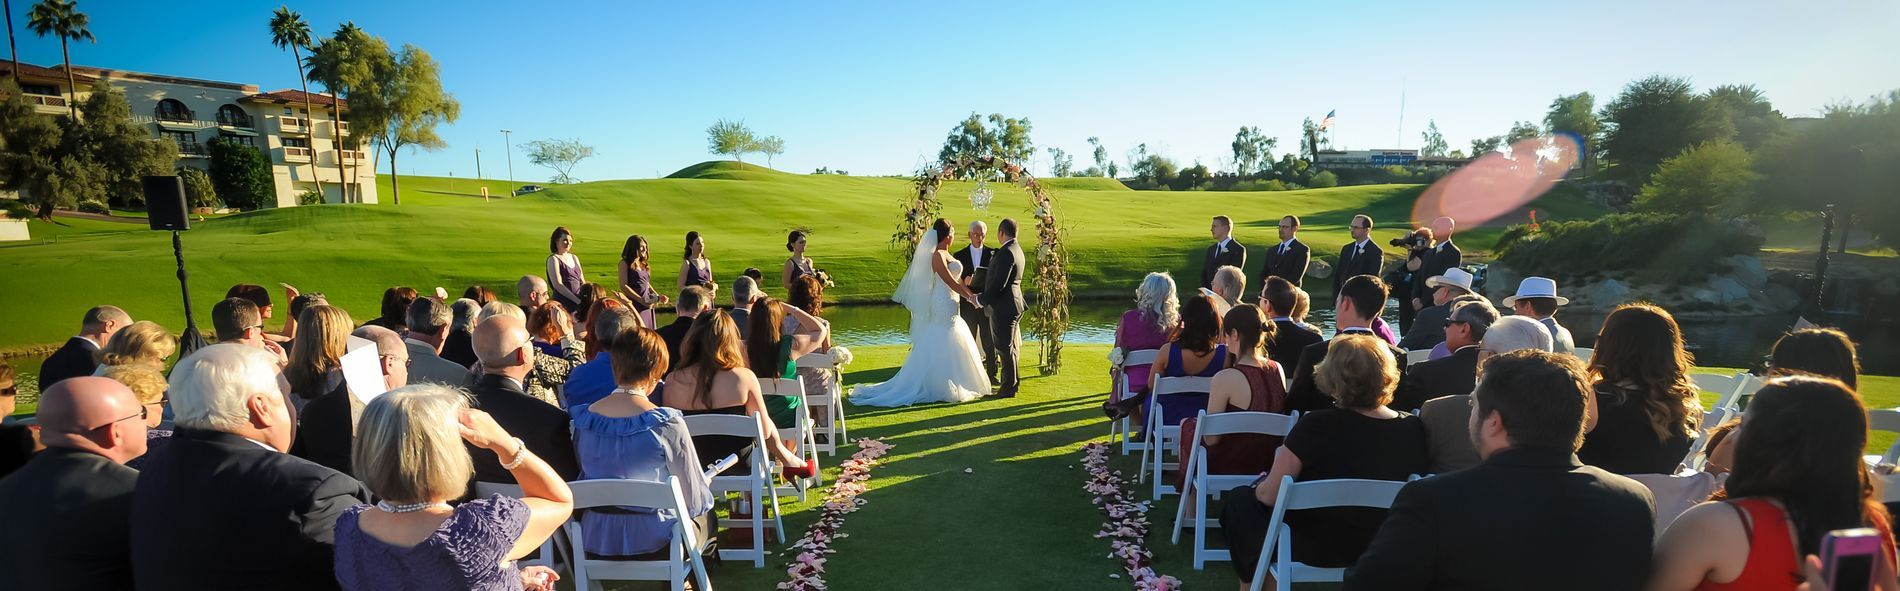 Wedding Reception Venues Phoenix Arizona Grand Resort Amp Spa